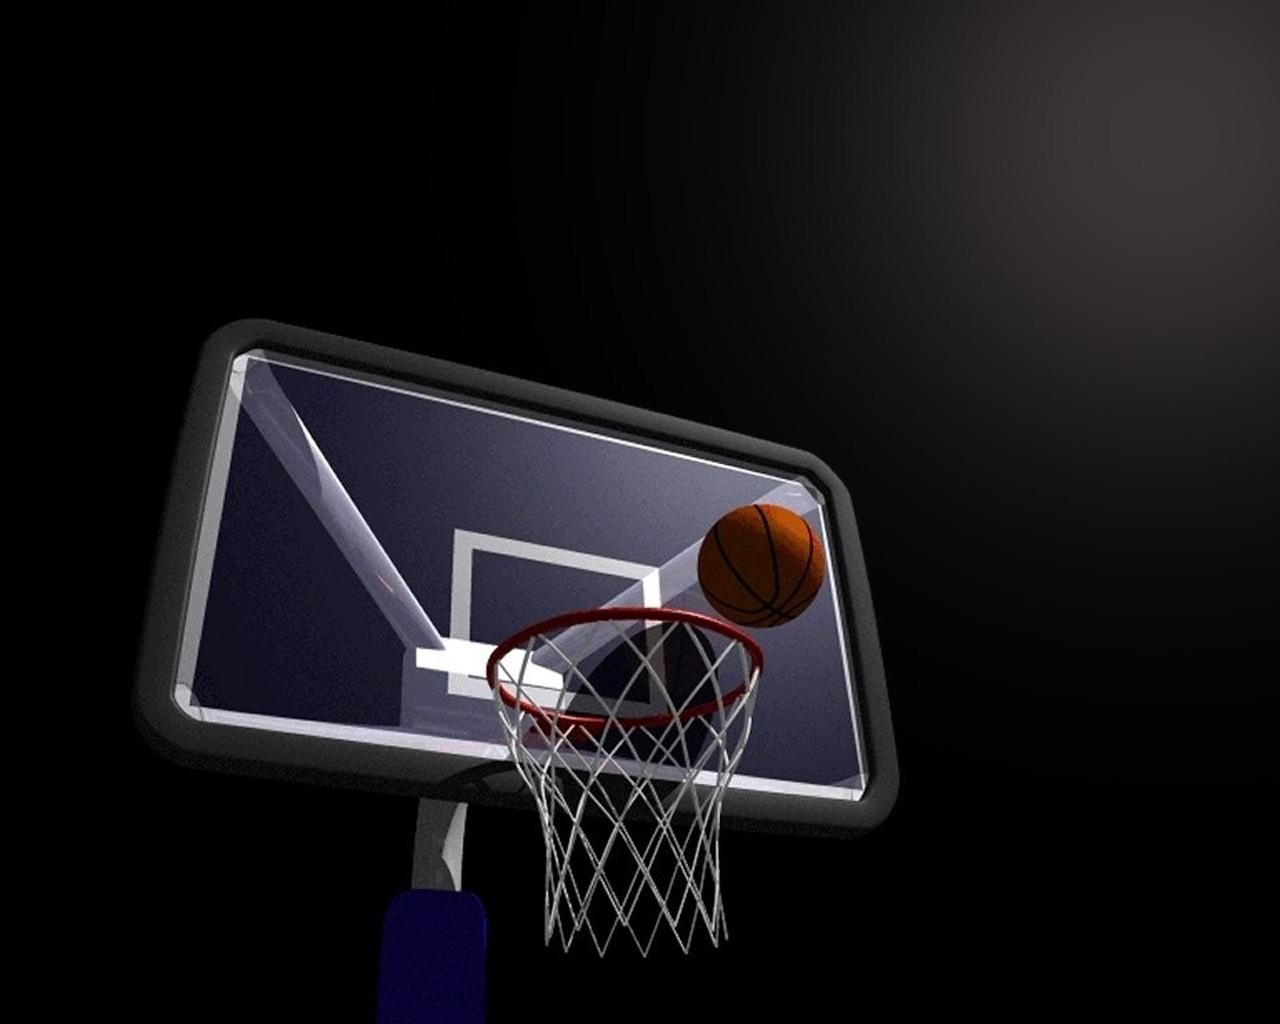 Fond D Ecran Dessin La Technologie Basketball Panier Ballon